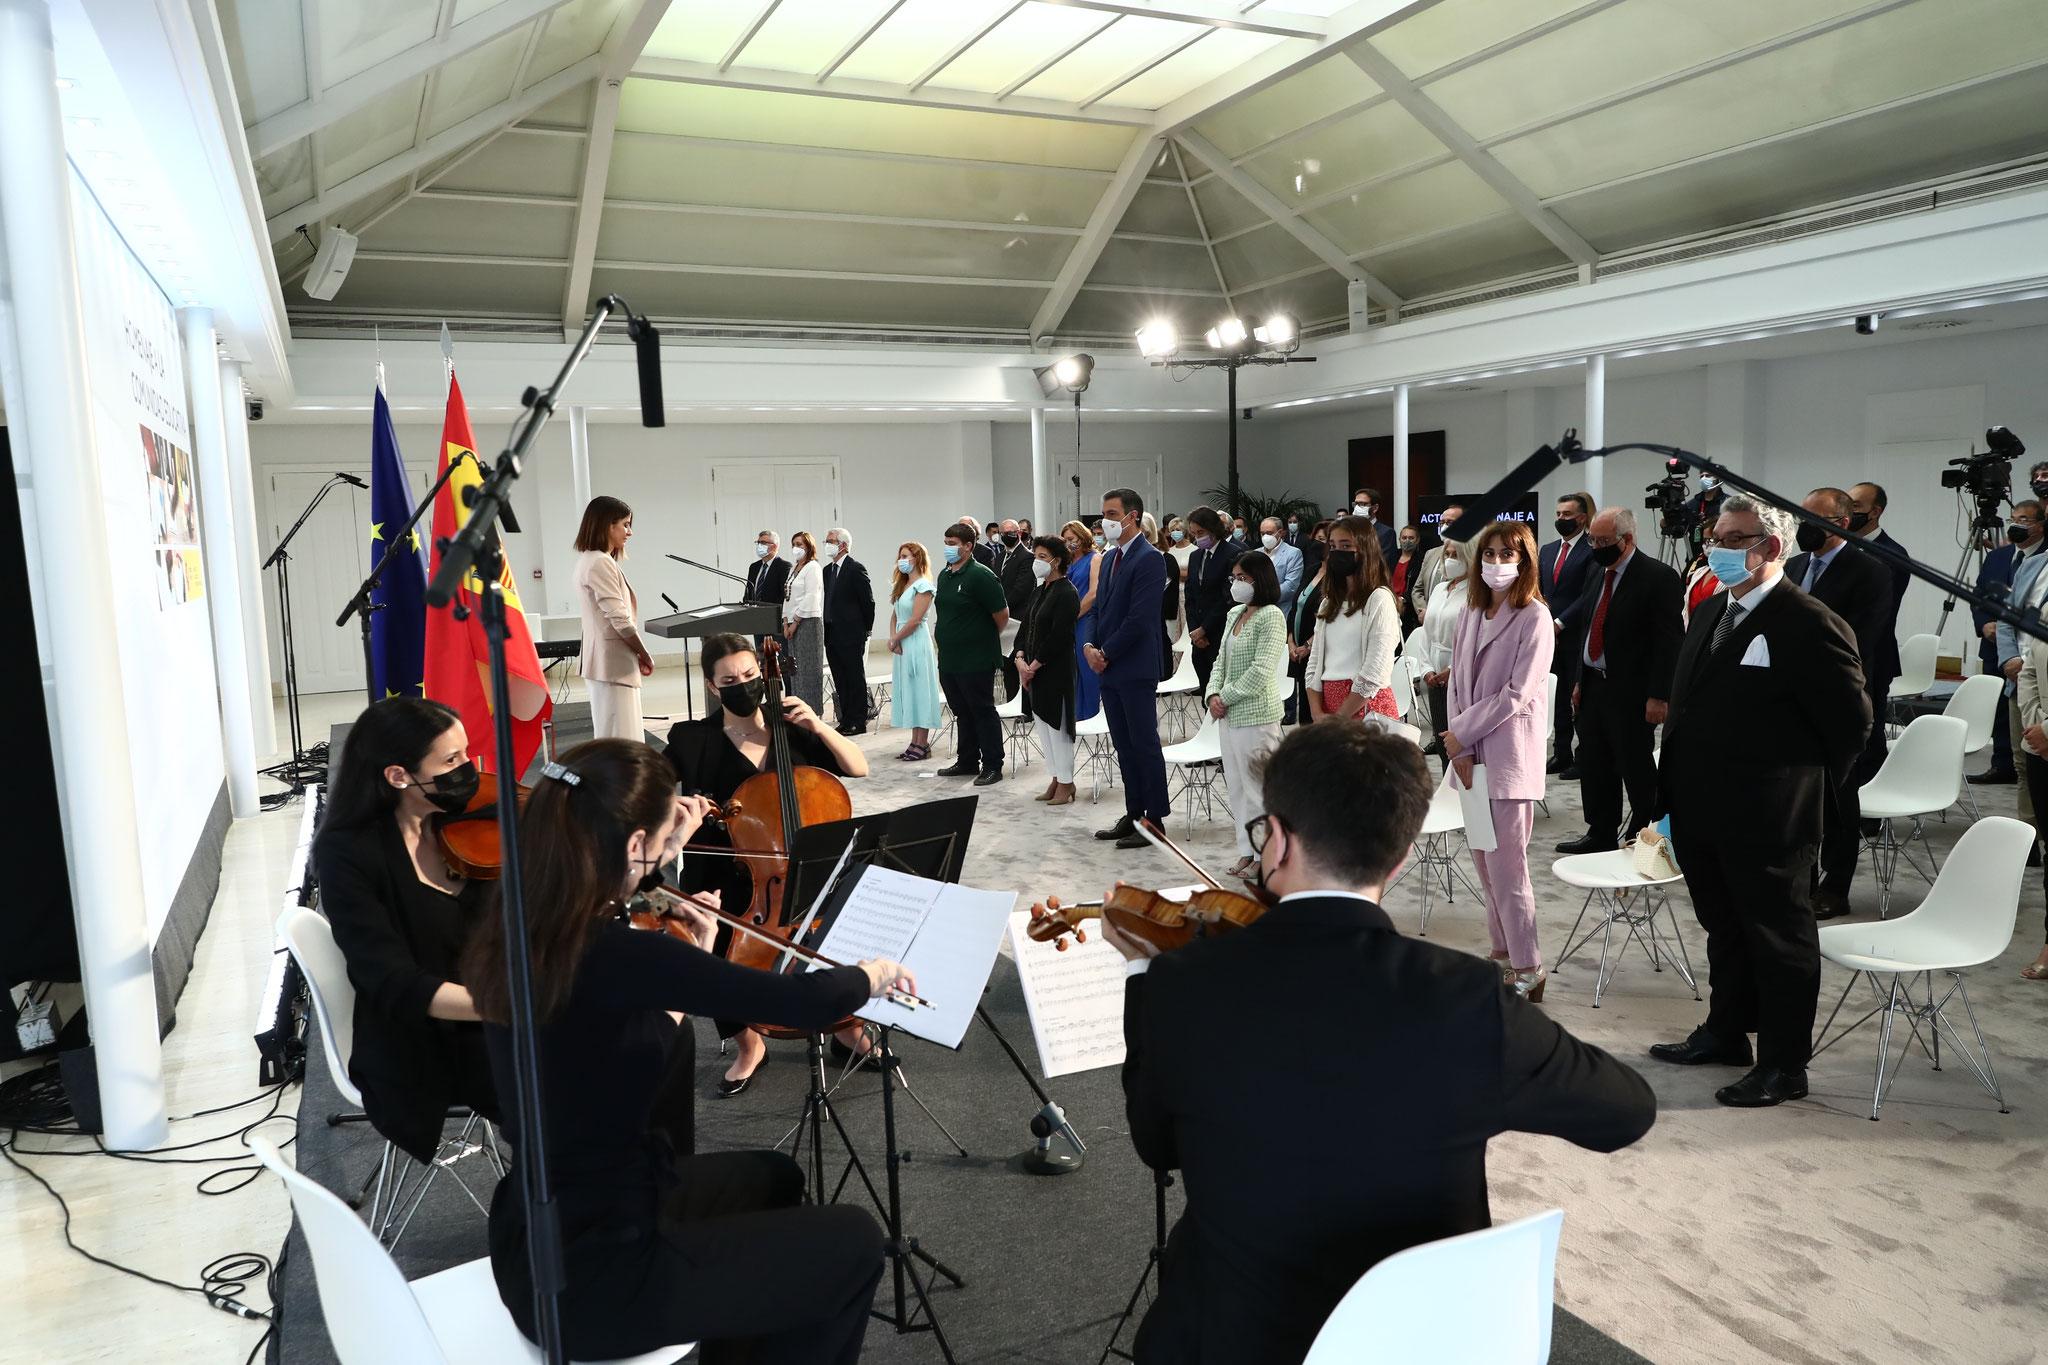 Acto oficial Gobierno de España. Palacio de la Moncloa.